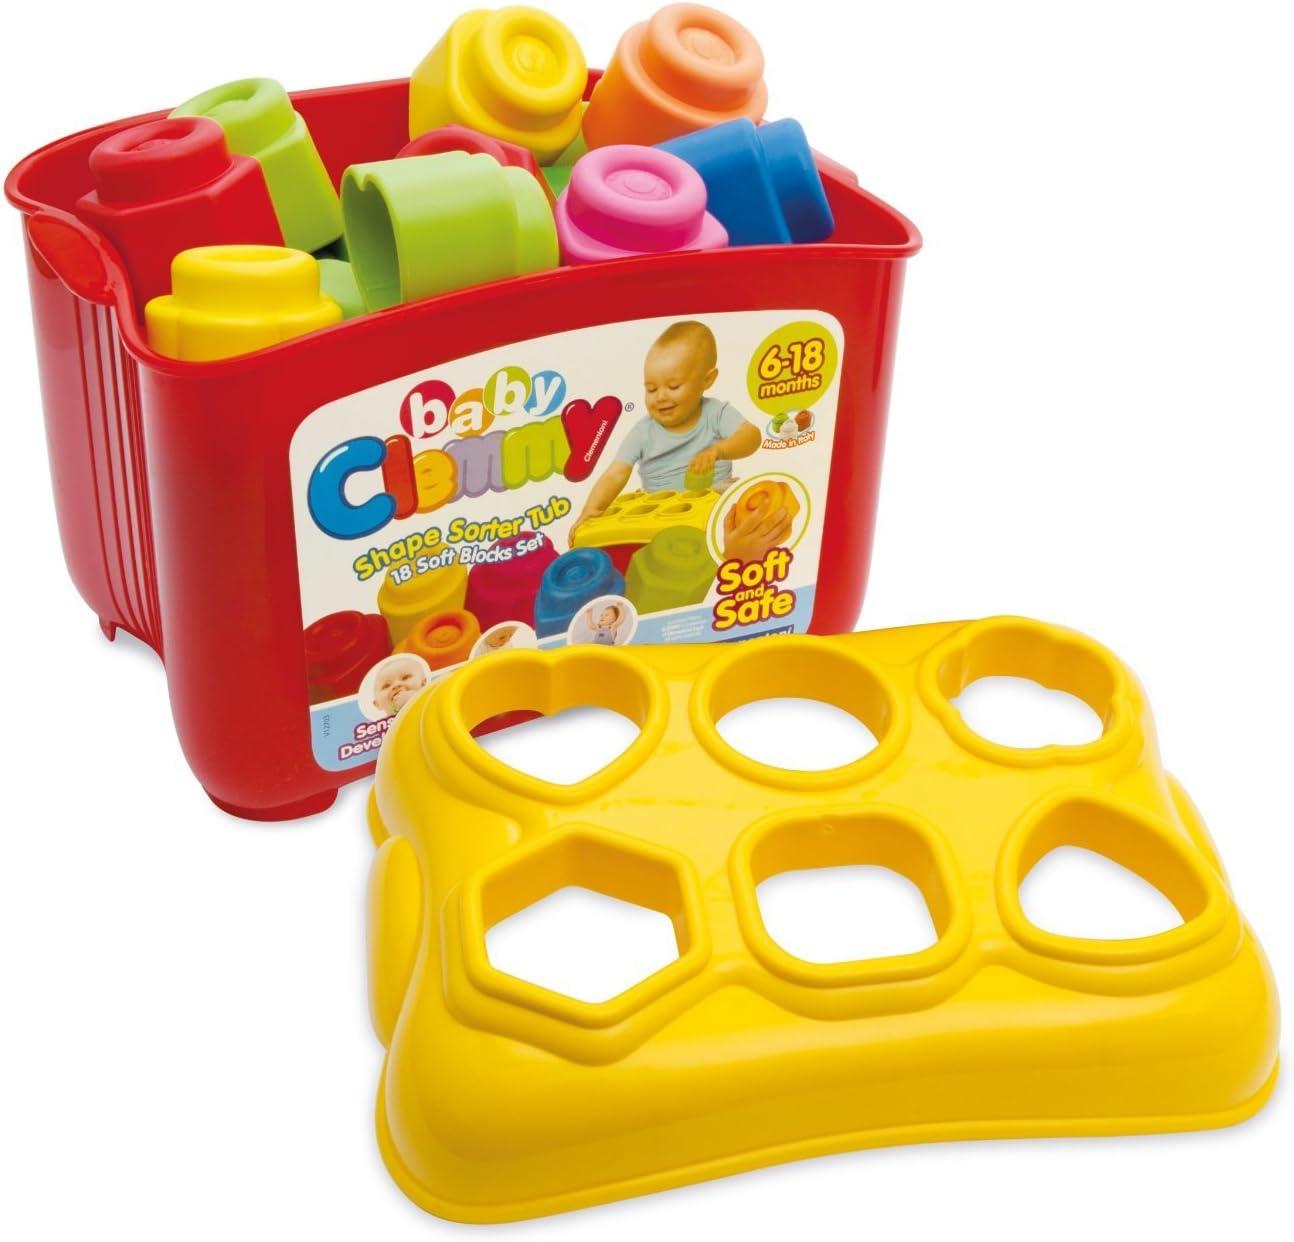 Clementoni Baby Clemmy Shape Sorter Basket with 18 Soft Blocks